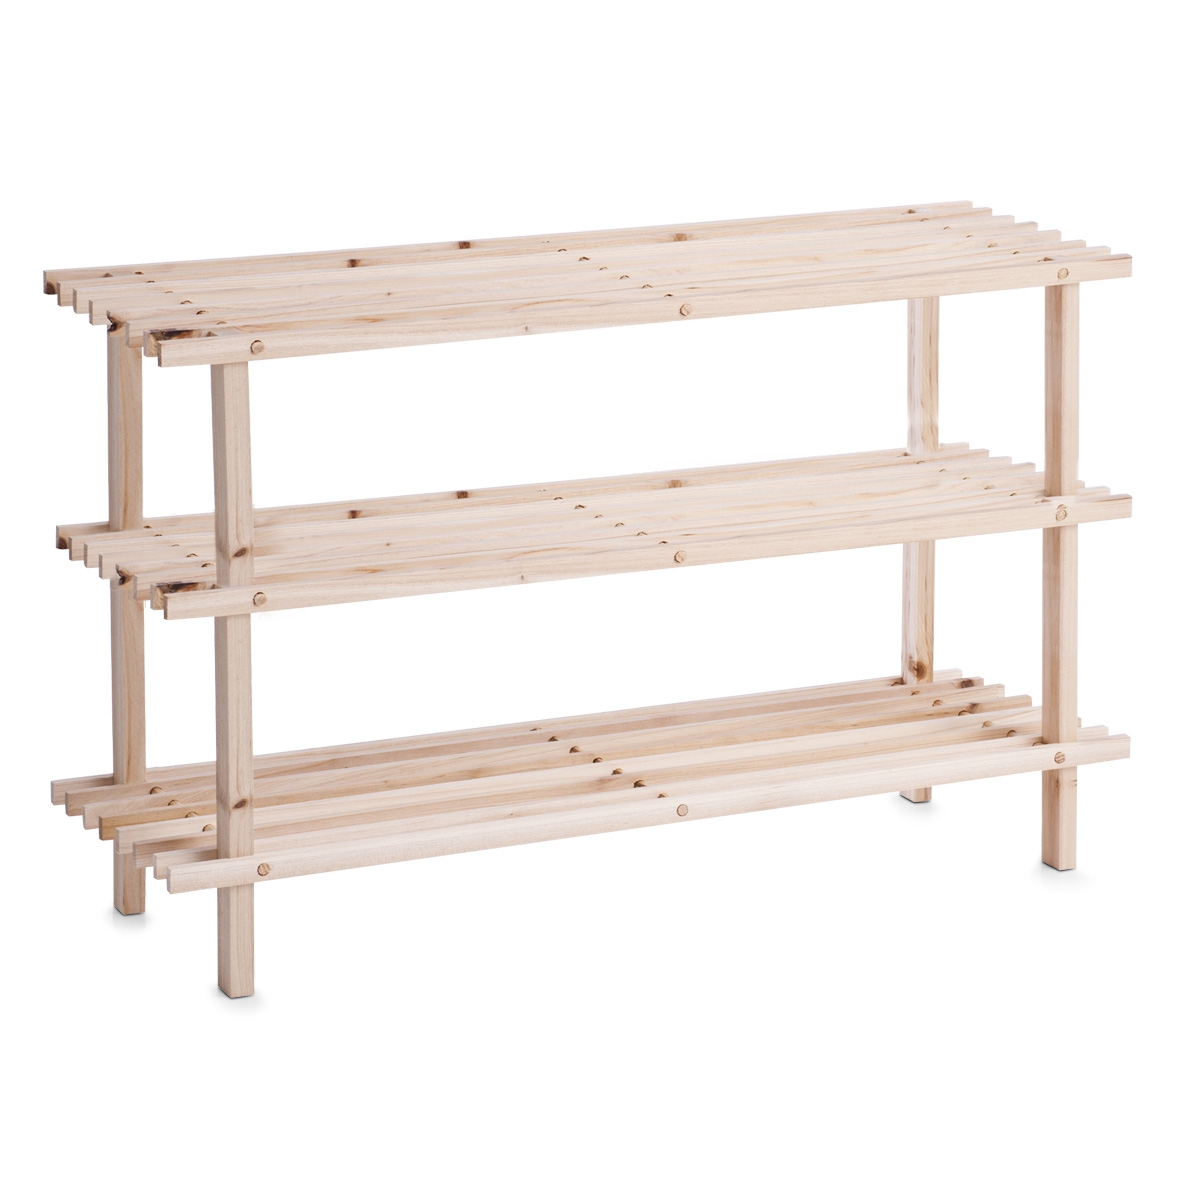 Suport pentru incaltaminte, din lemn, 2-Natural Wood, l80xA26xH49,5 cm imagine